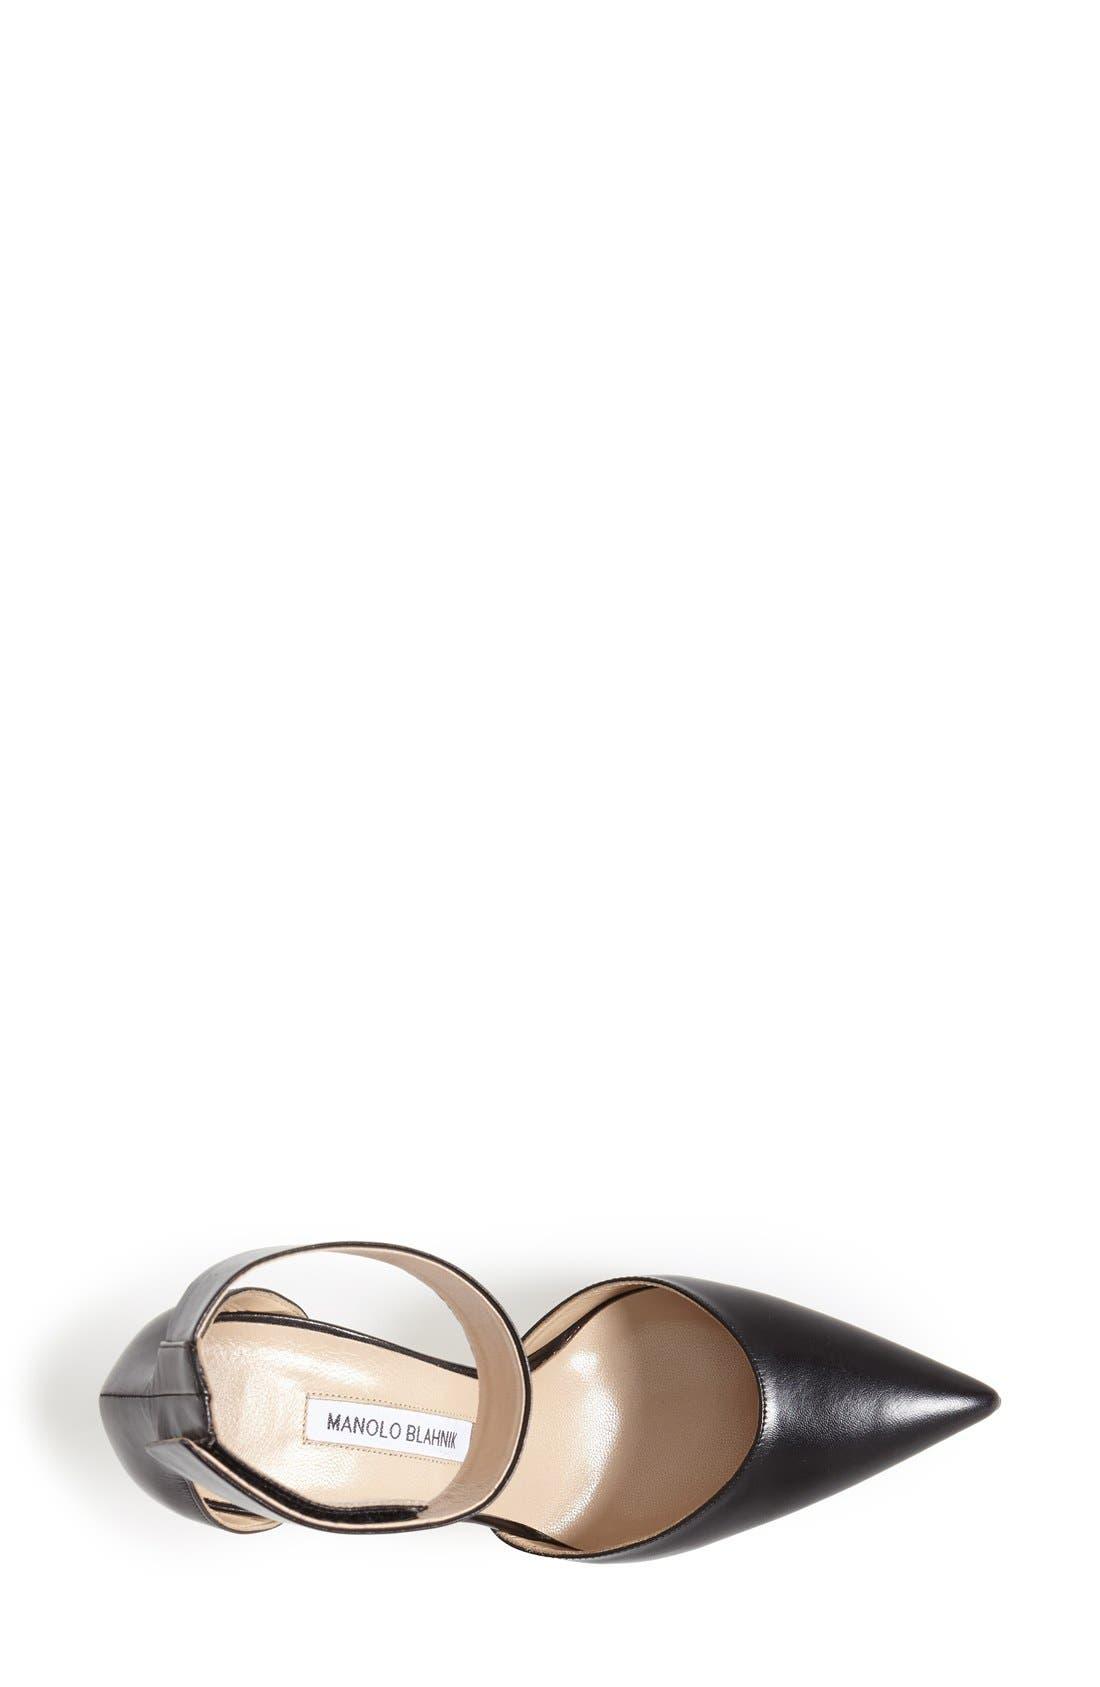 Alternate Image 3  - Manolo Blahnik 'Ollico' Ankle Cuff d'Orsay Pump (Women)